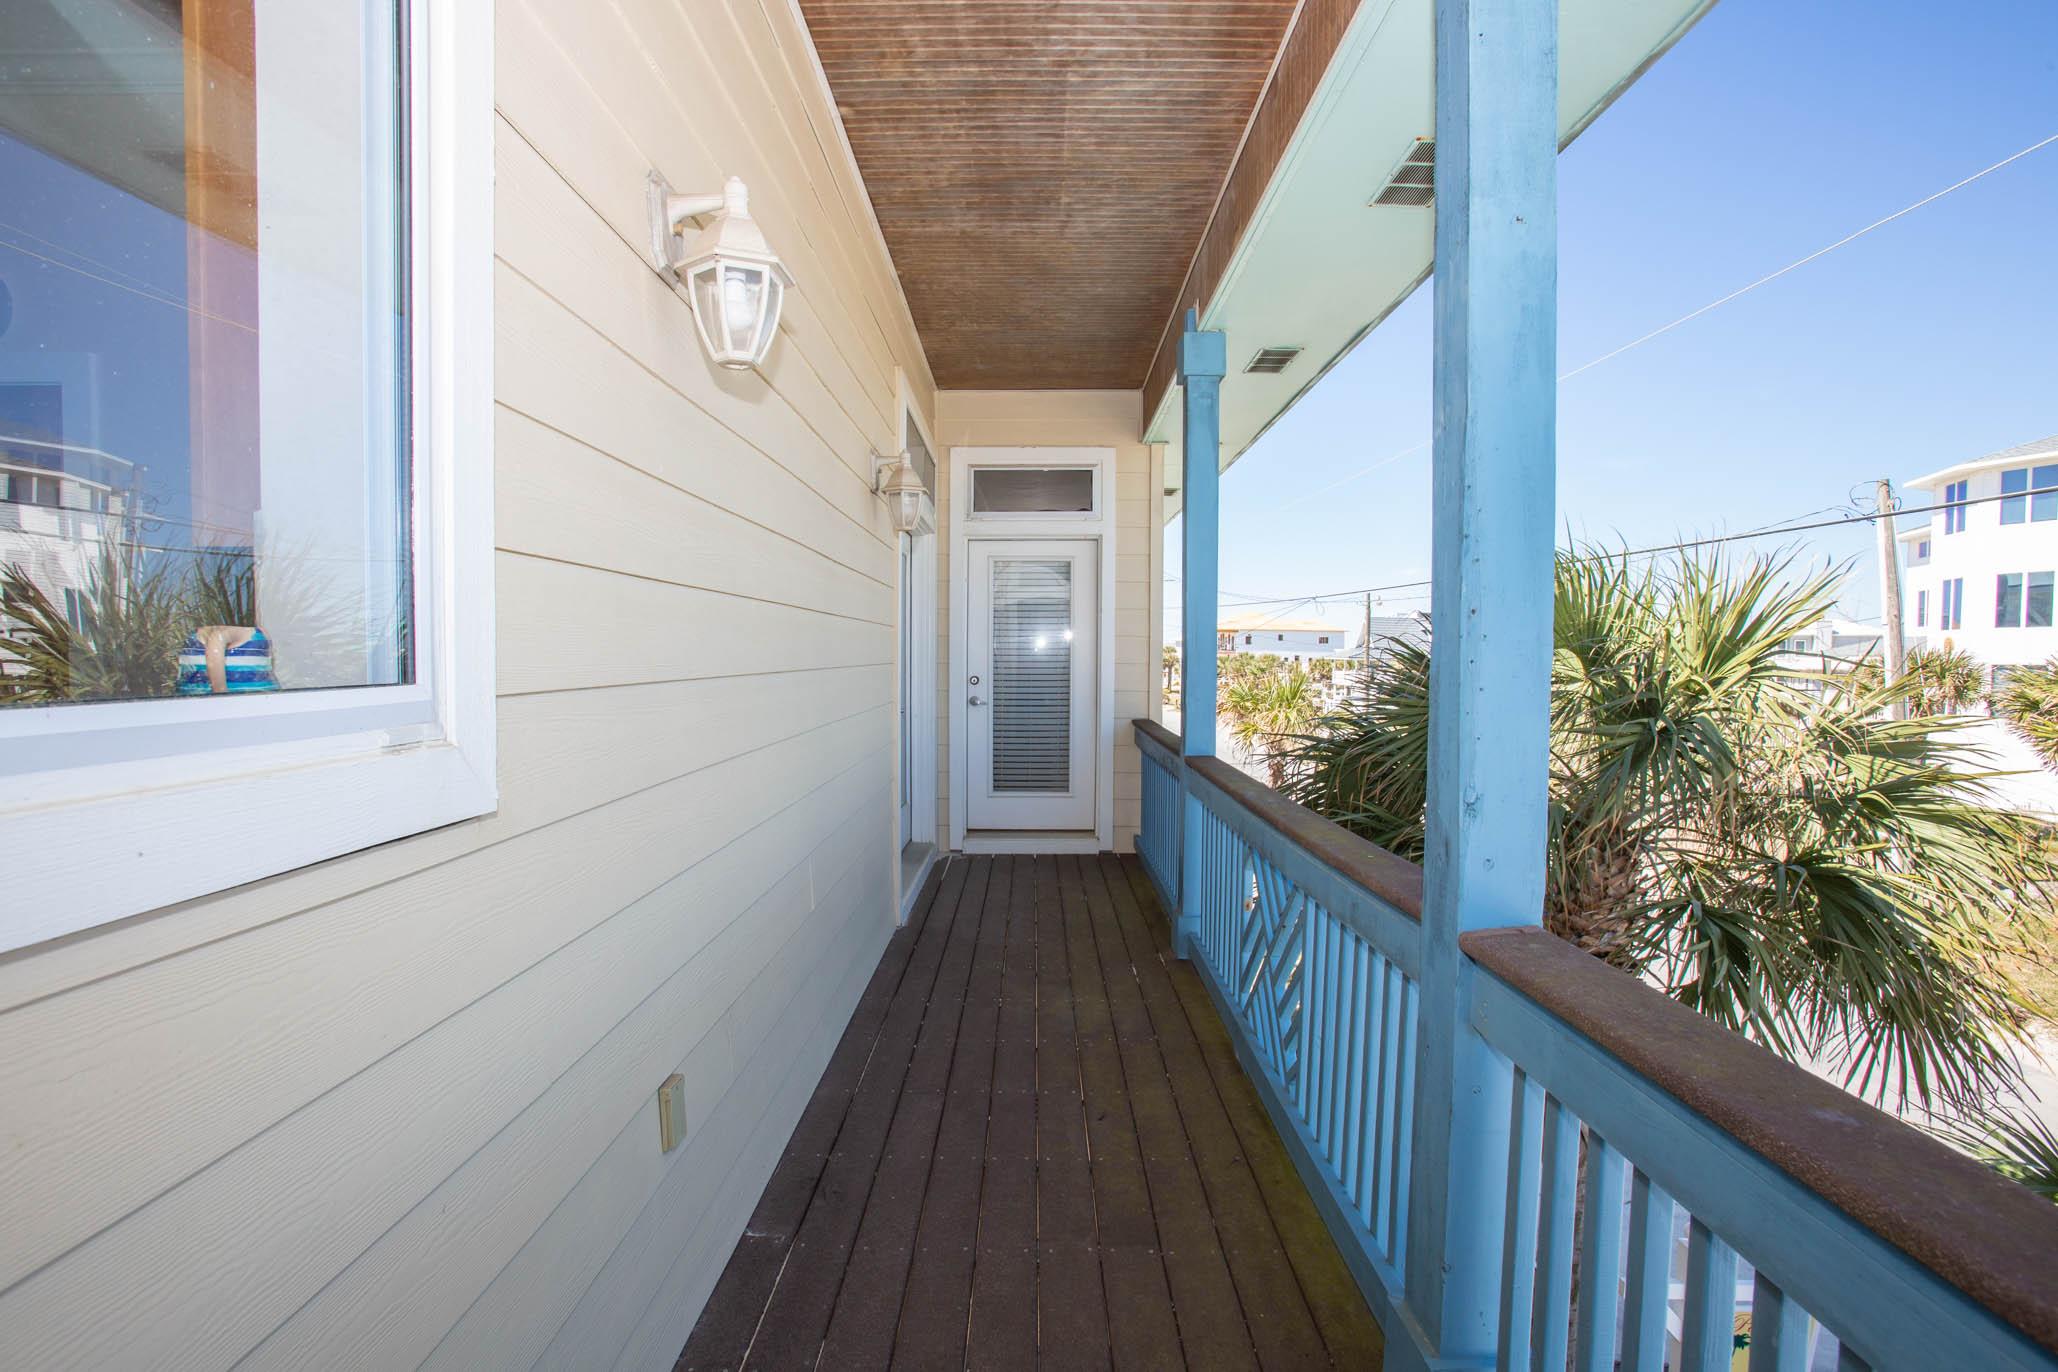 Ariola 1214 House/Cottage rental in Luxury Homes in Pensacola Beach Florida - #36